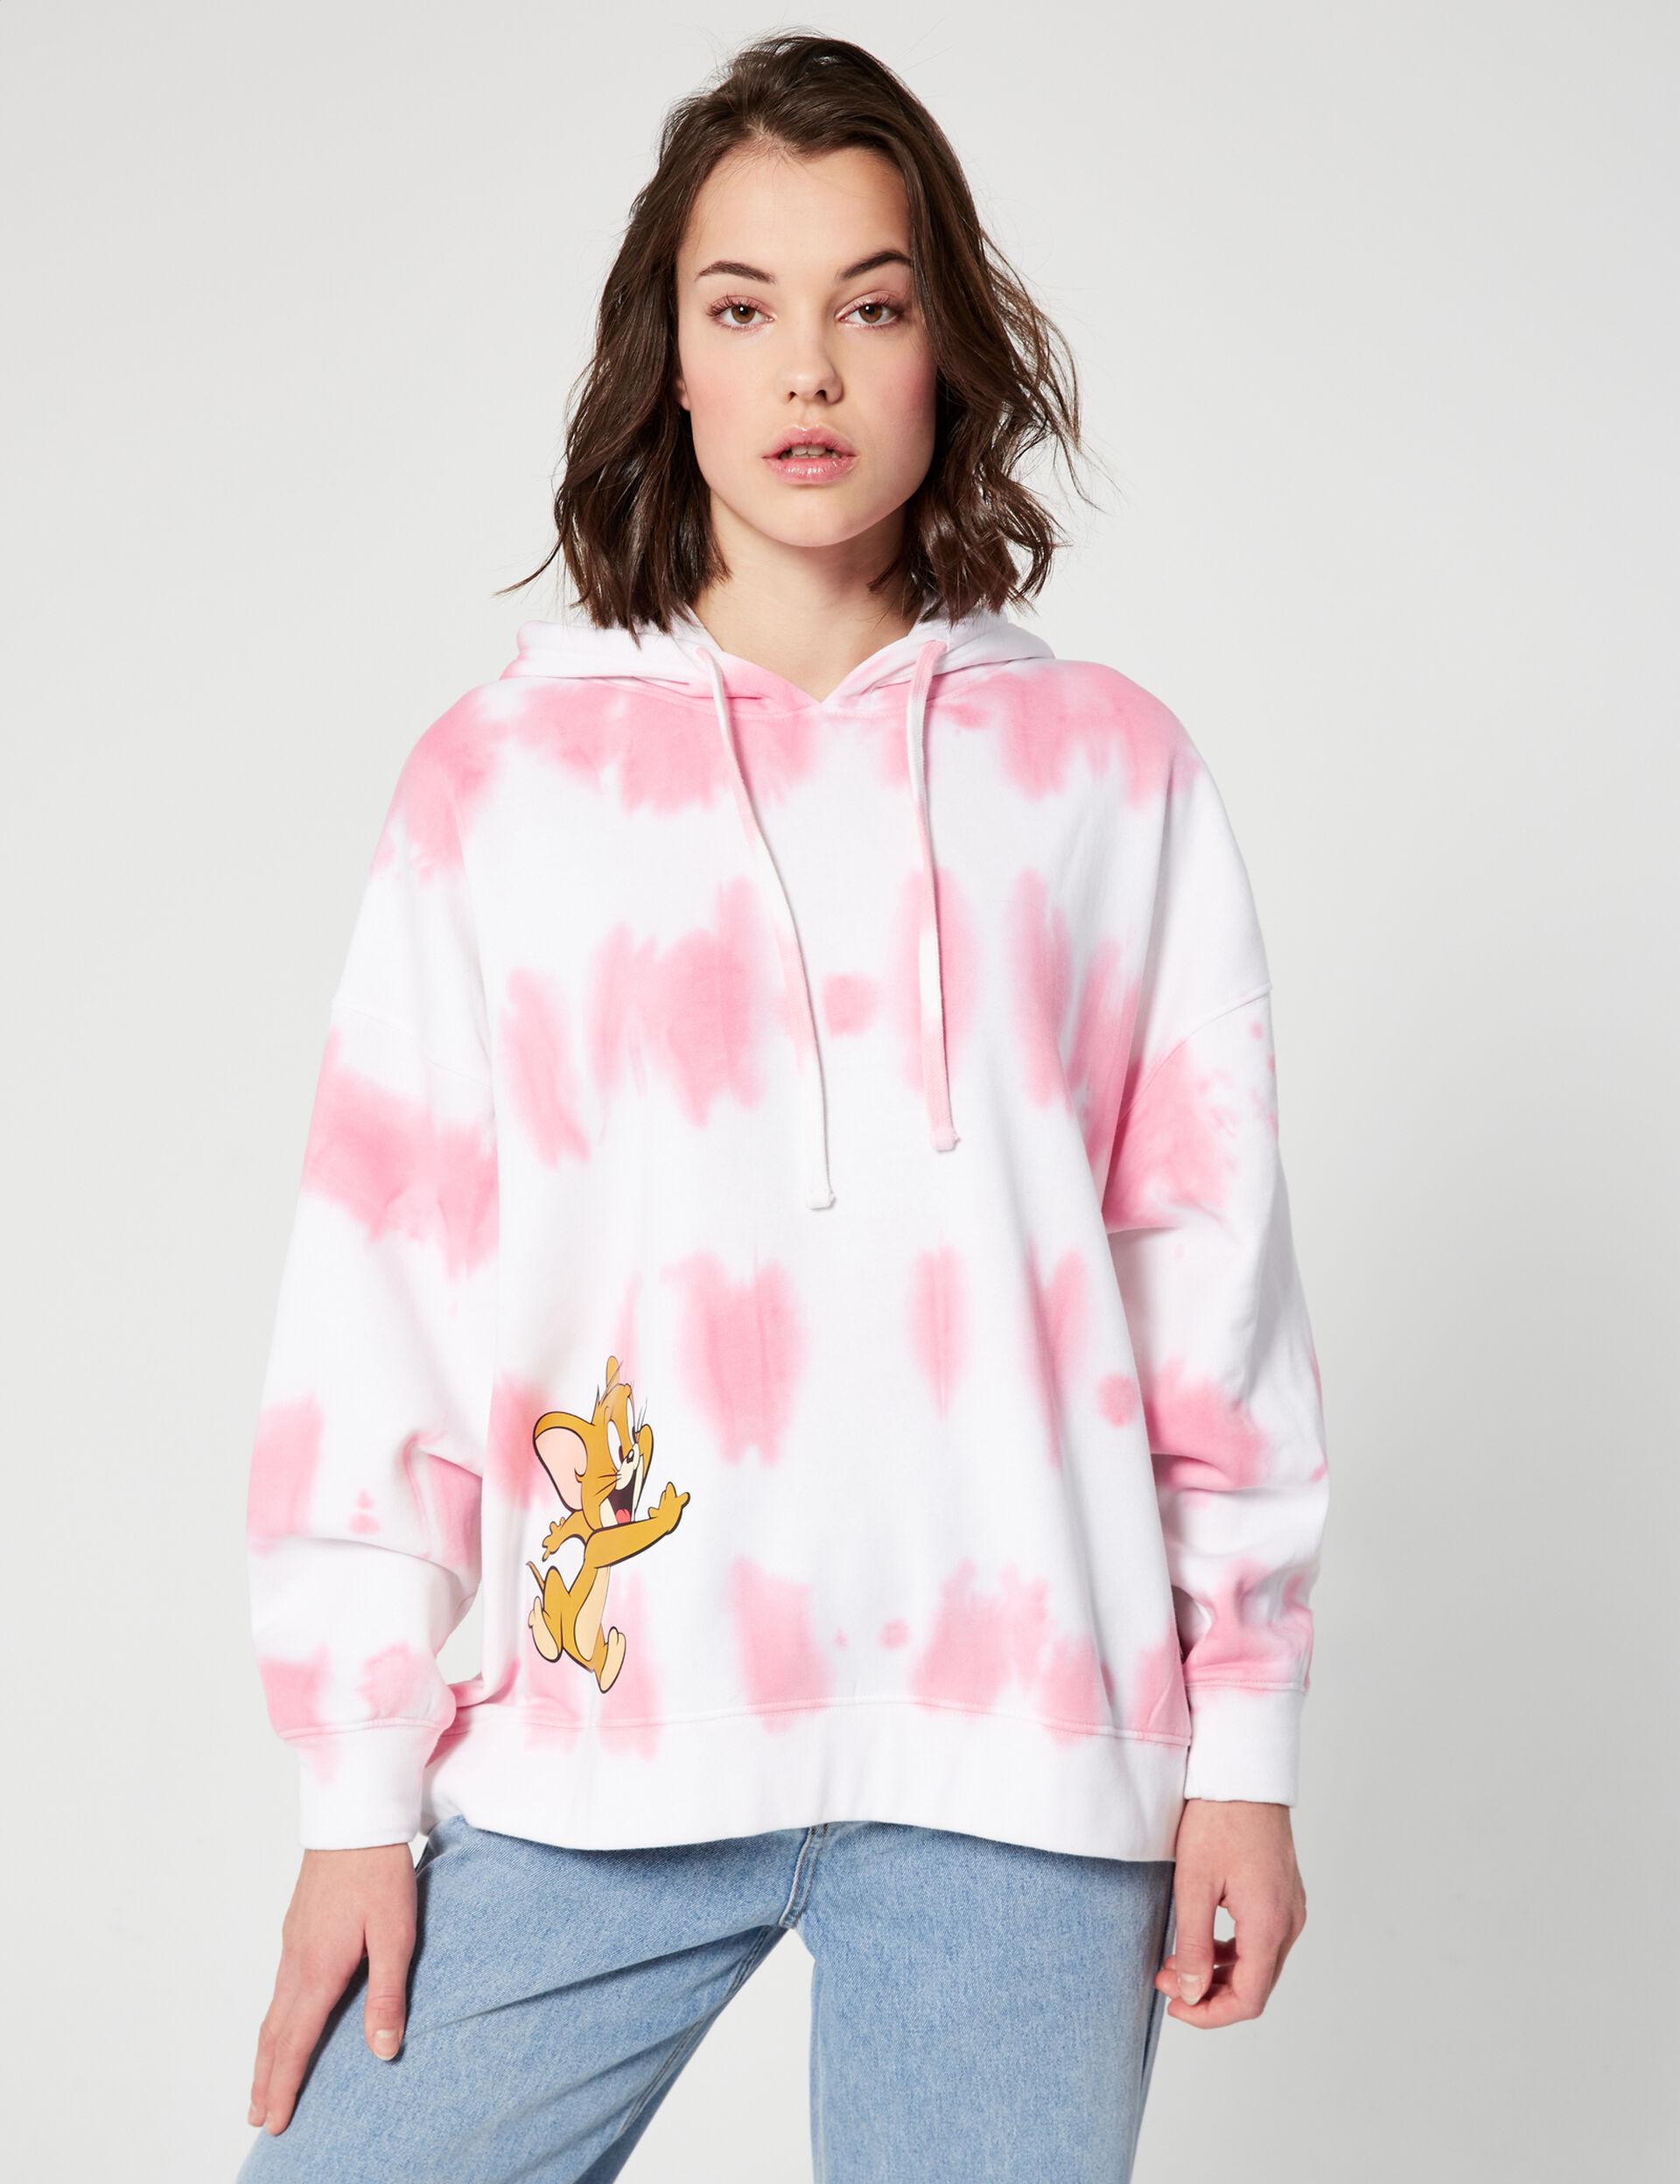 Tom and Jerry tie-dye sweatshirt